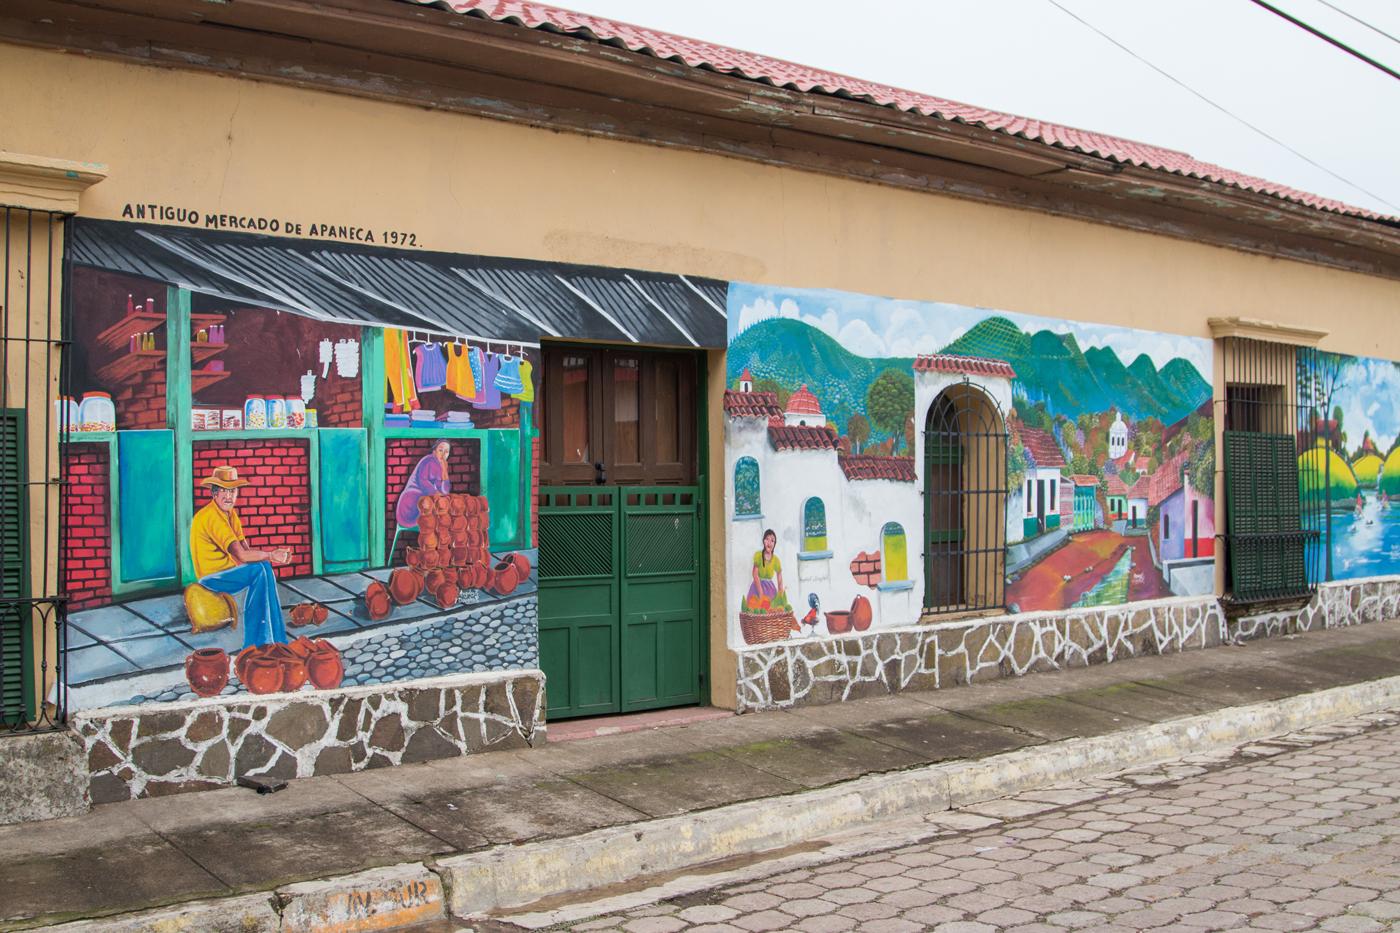 Painted murals